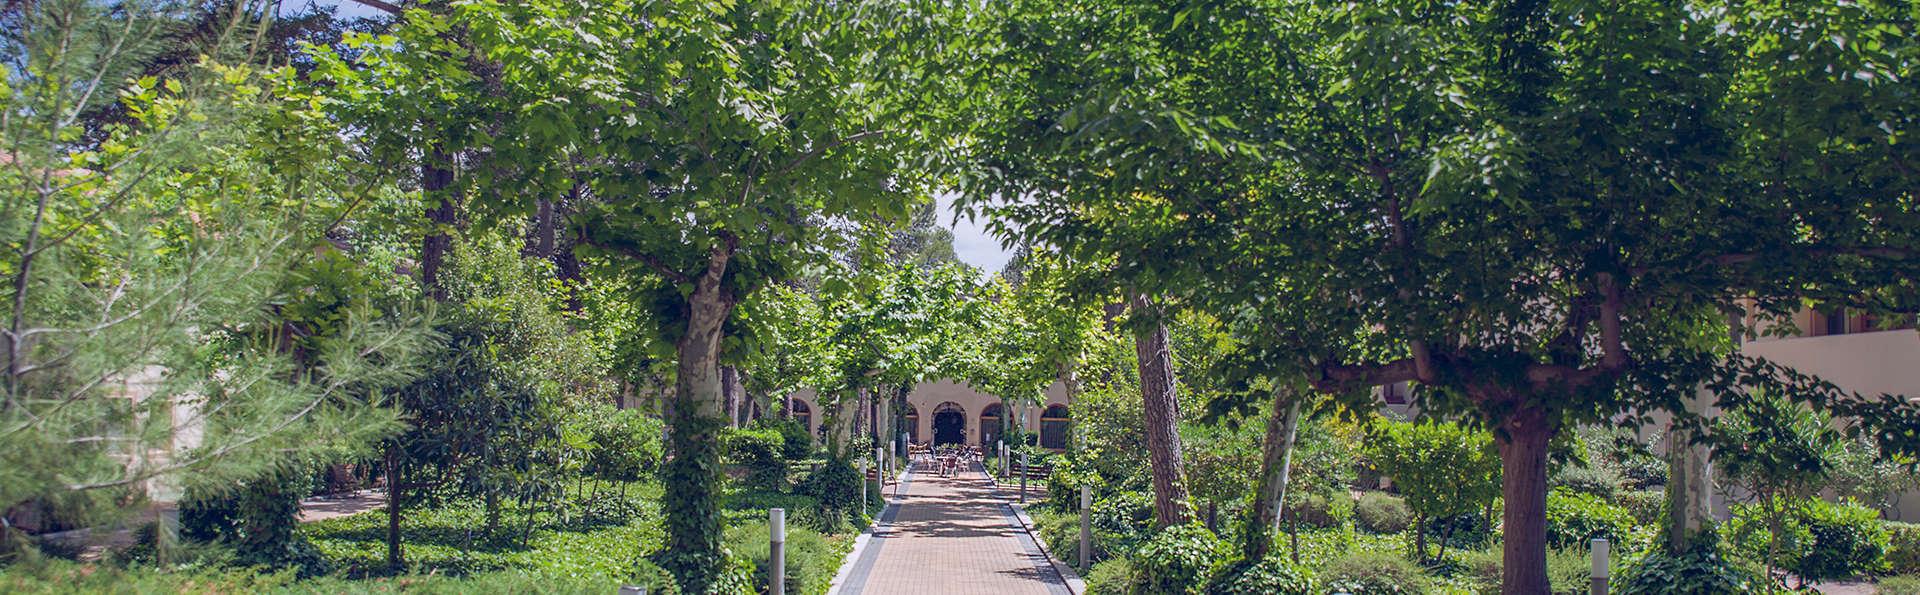 Confluent Health Resort - edit_garden2.jpg